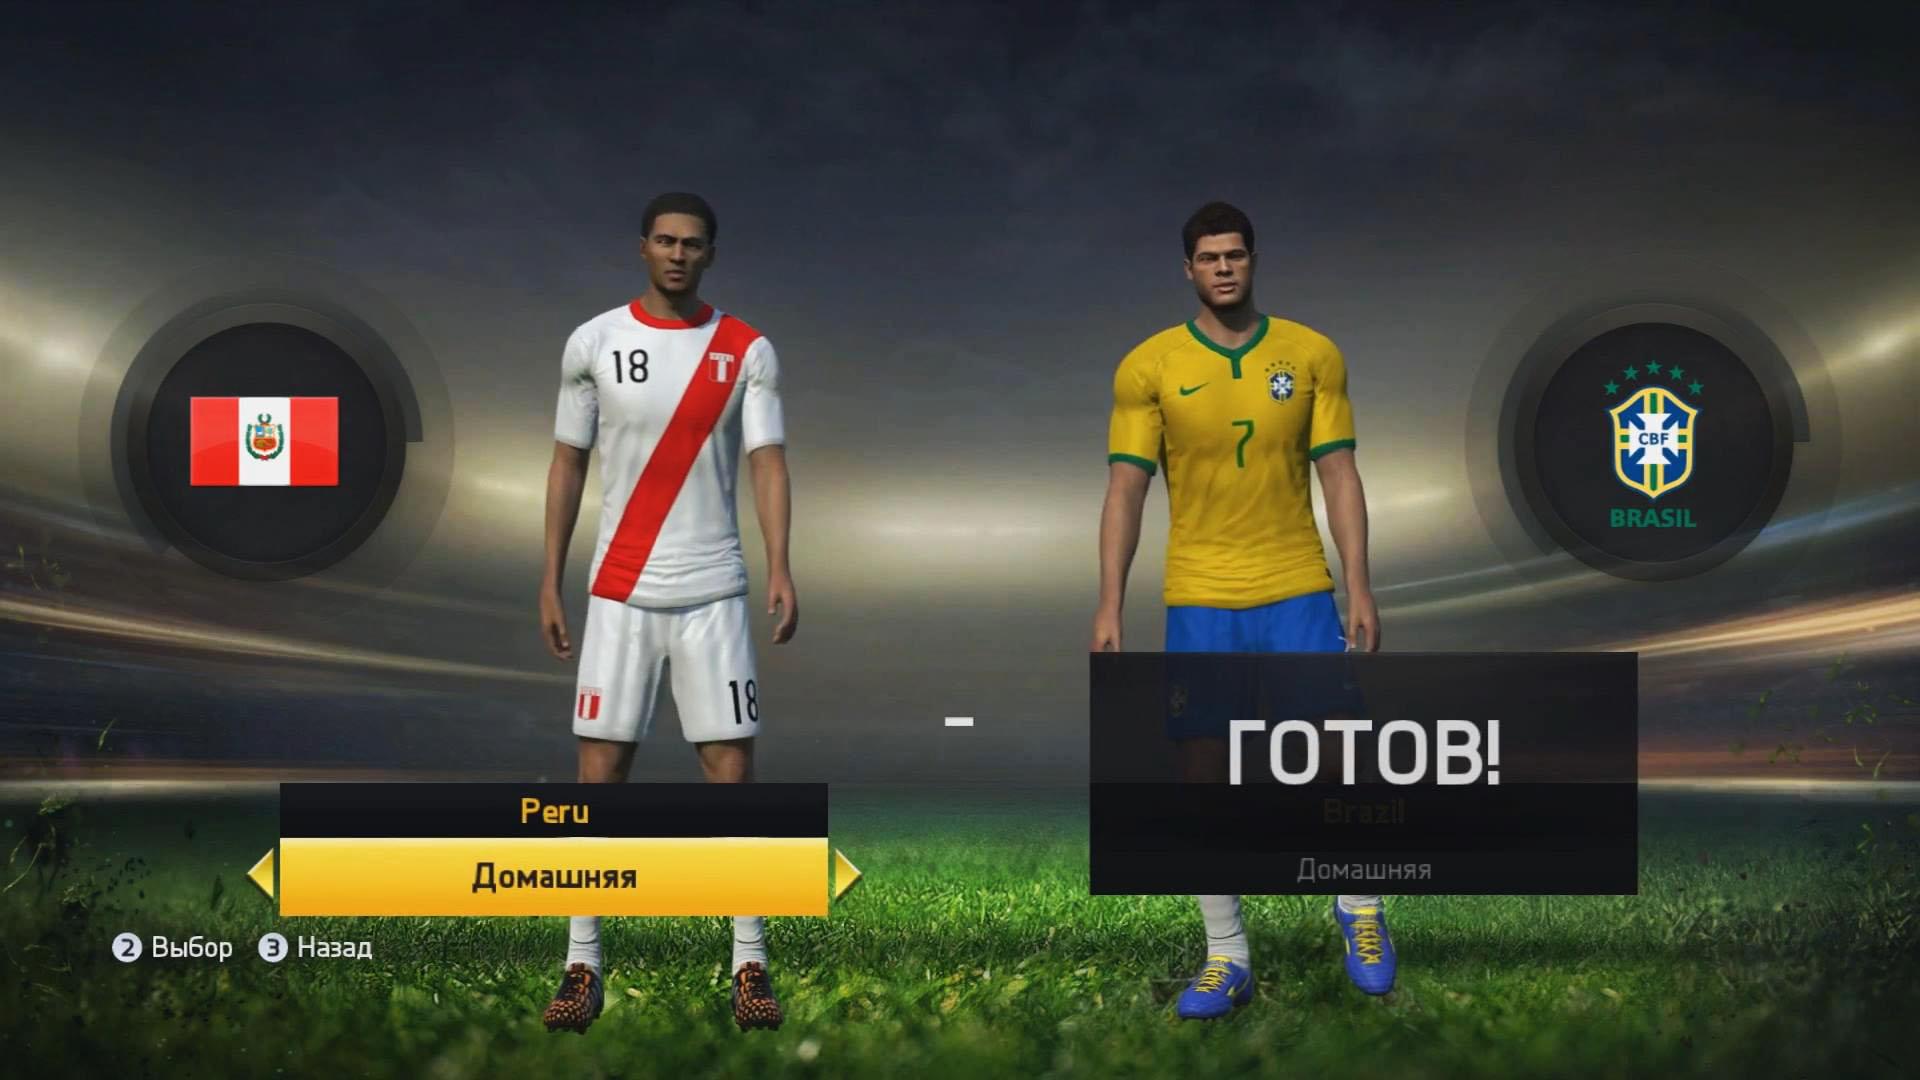 Fifa 15 free download full version game crack (pc).